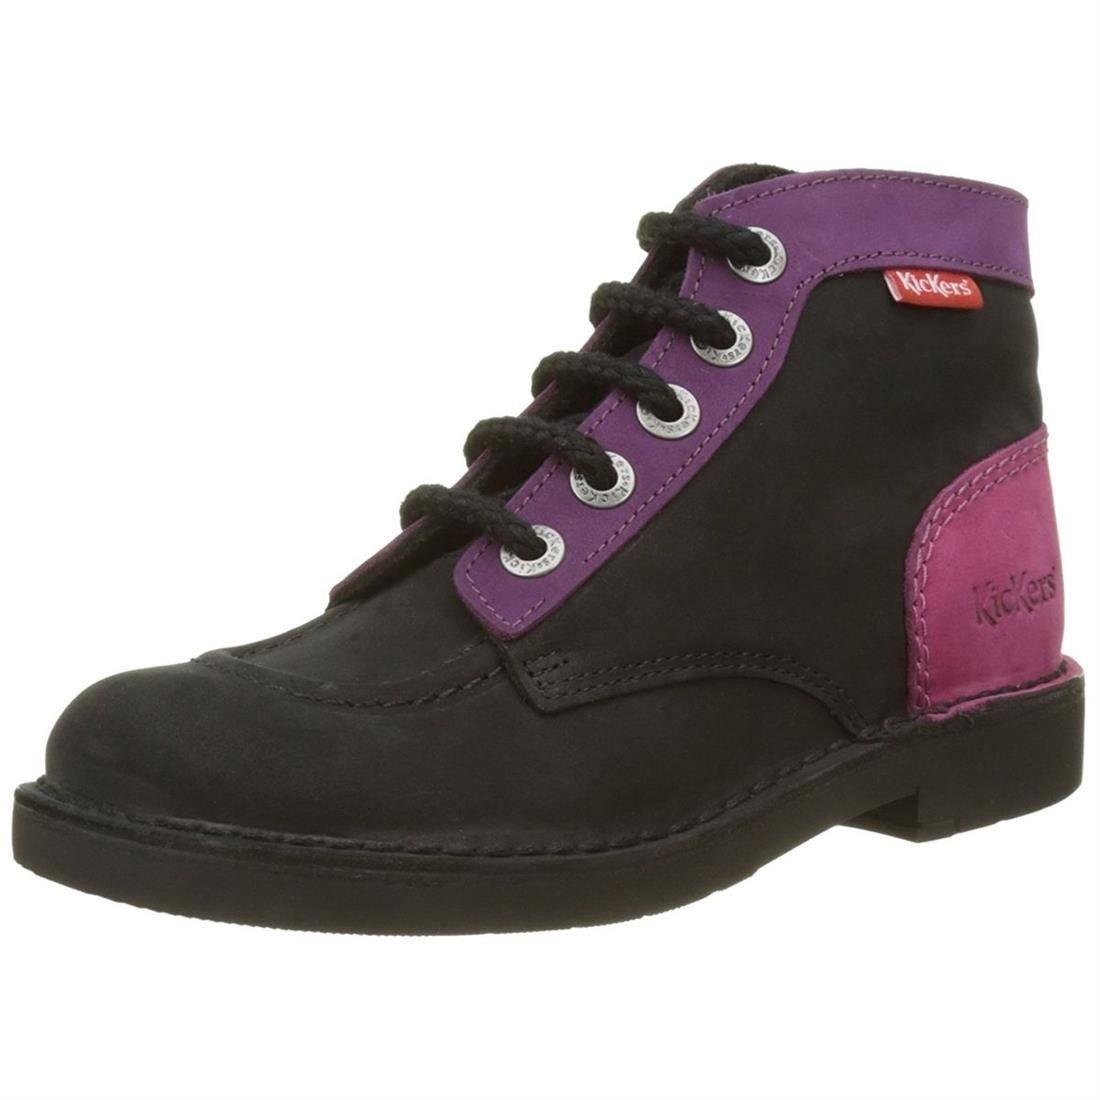 49a73de236f26c billista cuir vernis filles kickers 351387 | Chaussures Kickers | Hiking  Boots, Sneakers et Shoes